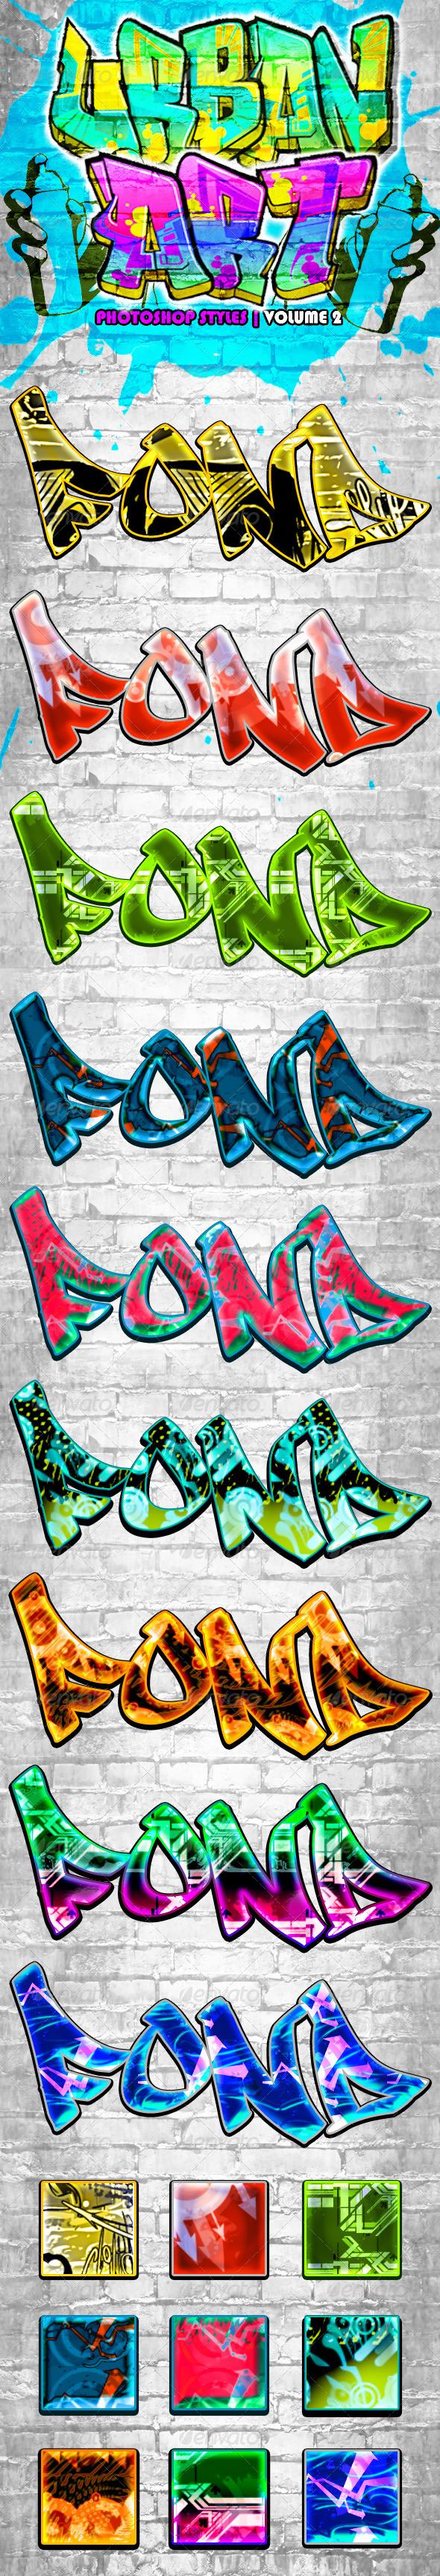 GraphicRiver Urban Art Graffiti Styles Volume 2 6583021